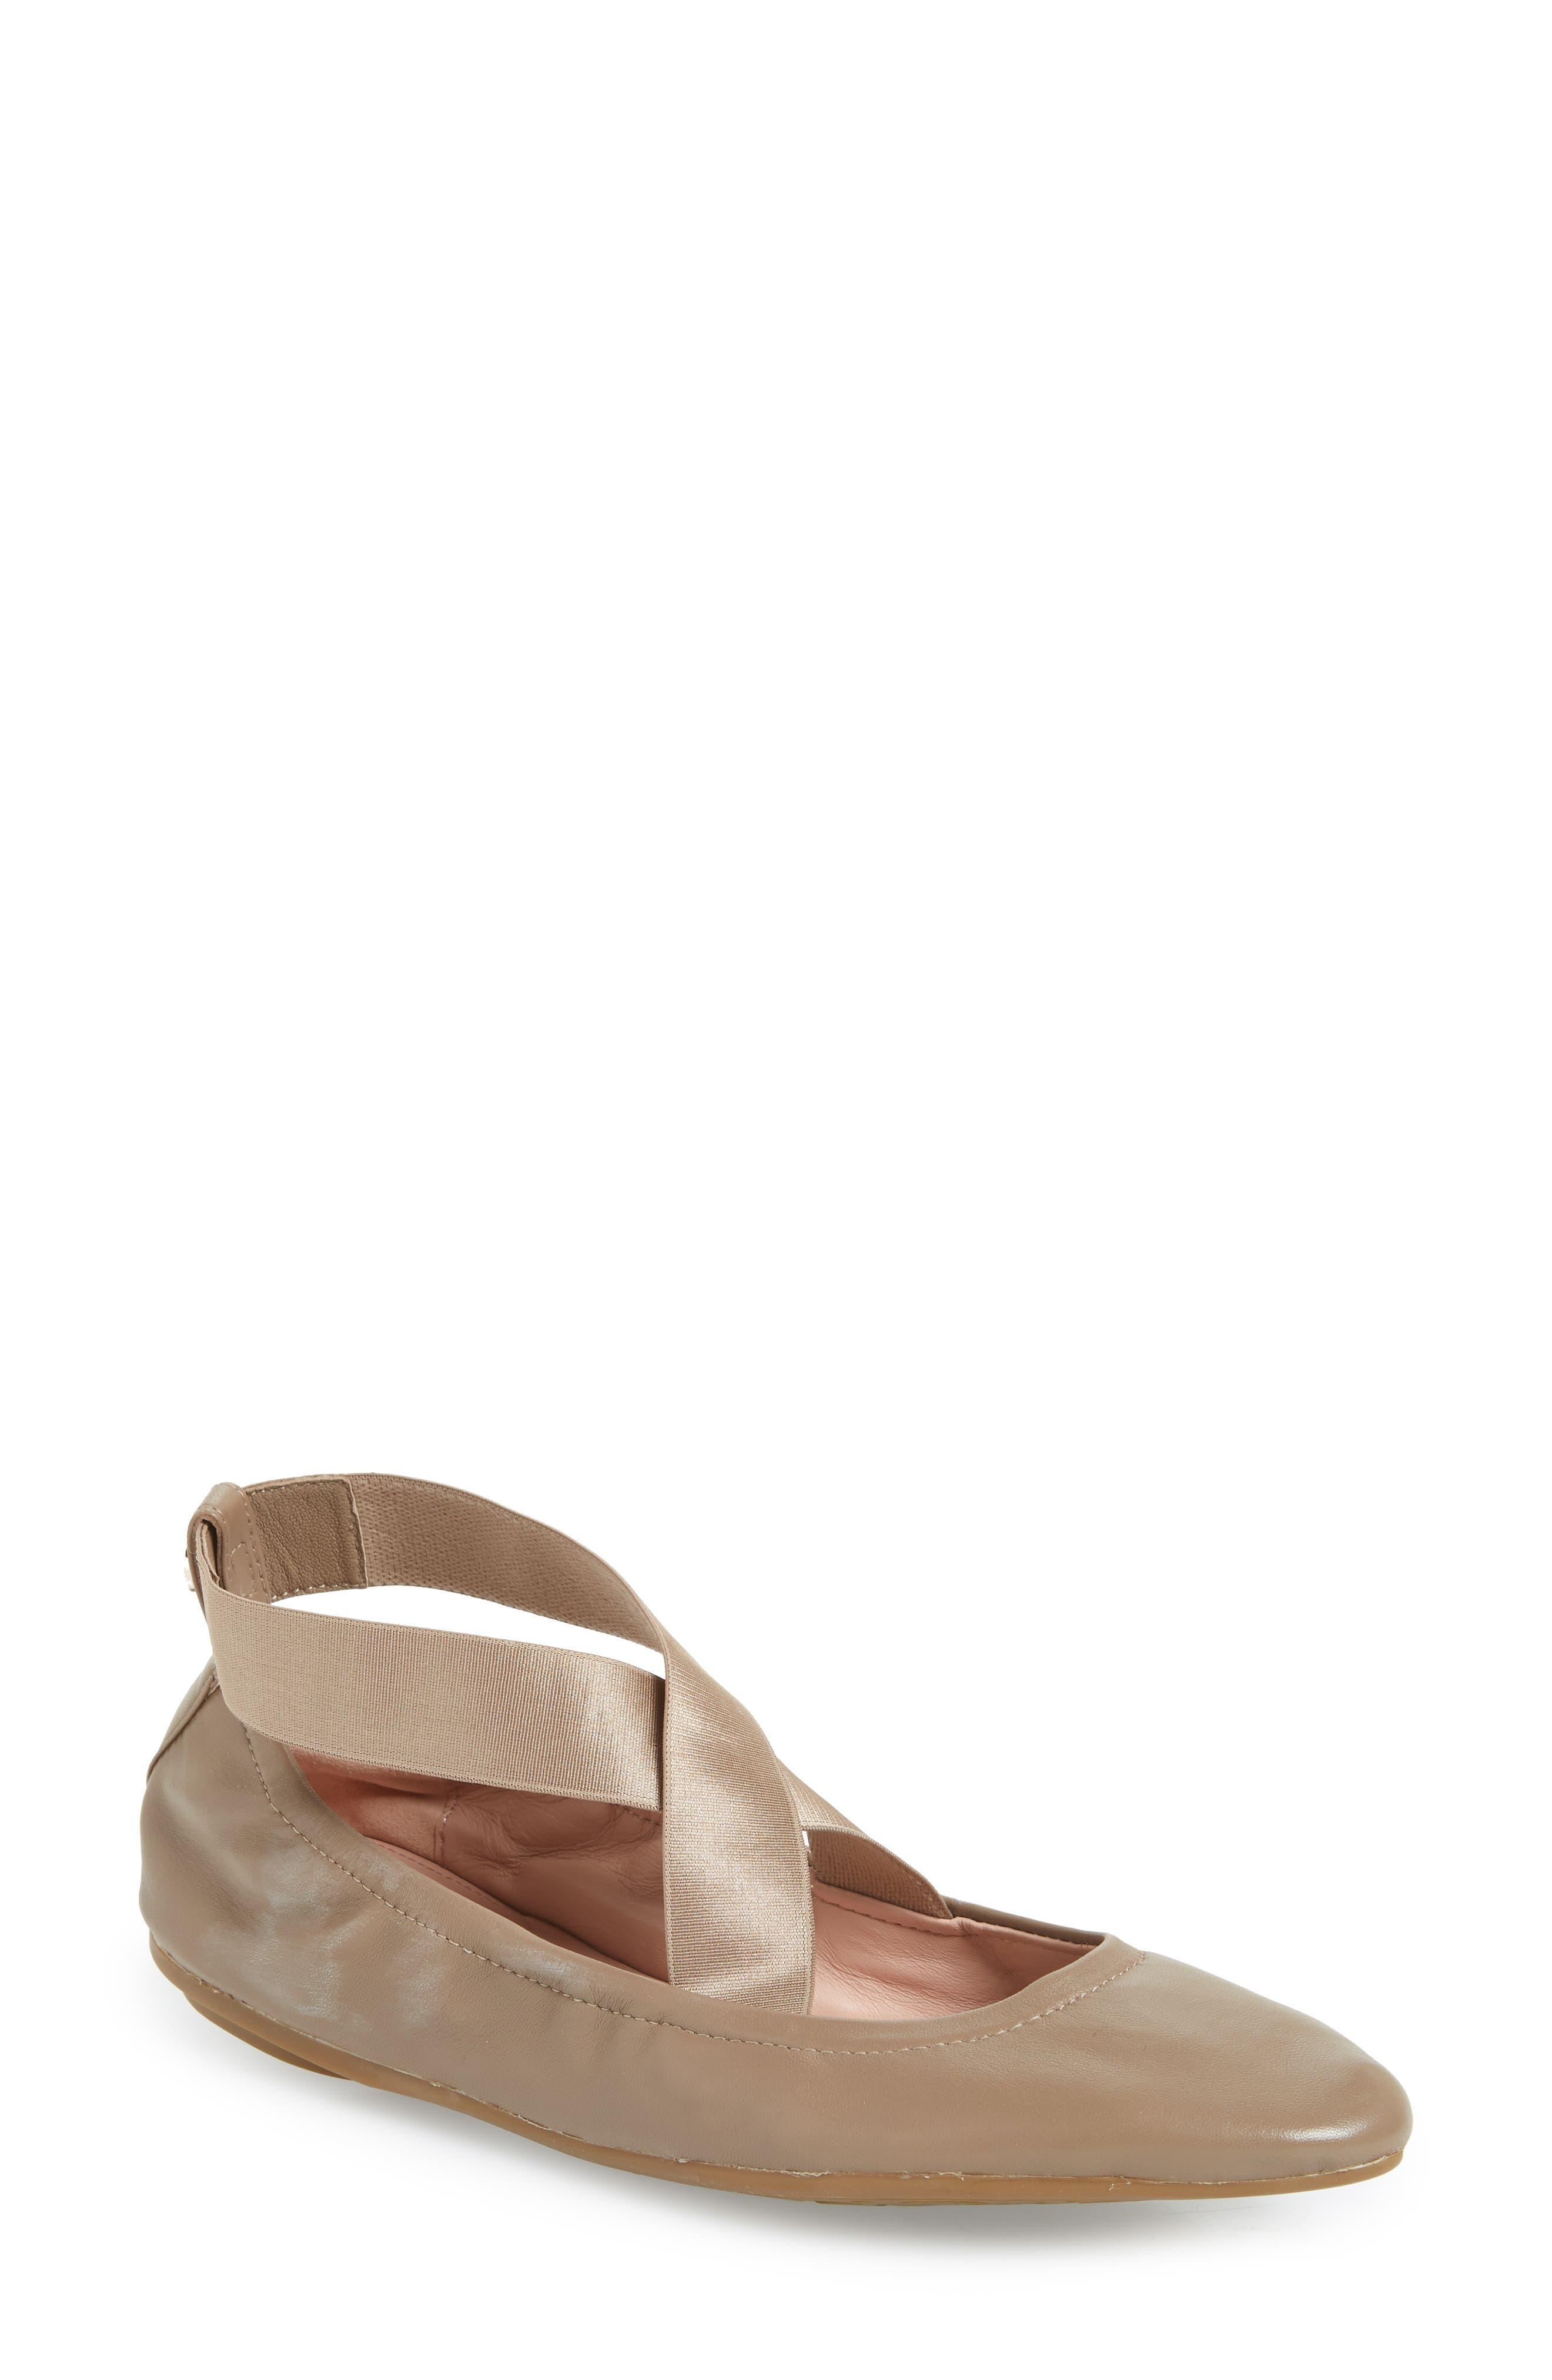 Taryn Rose Edina Strappy Ballet Flat, Beige